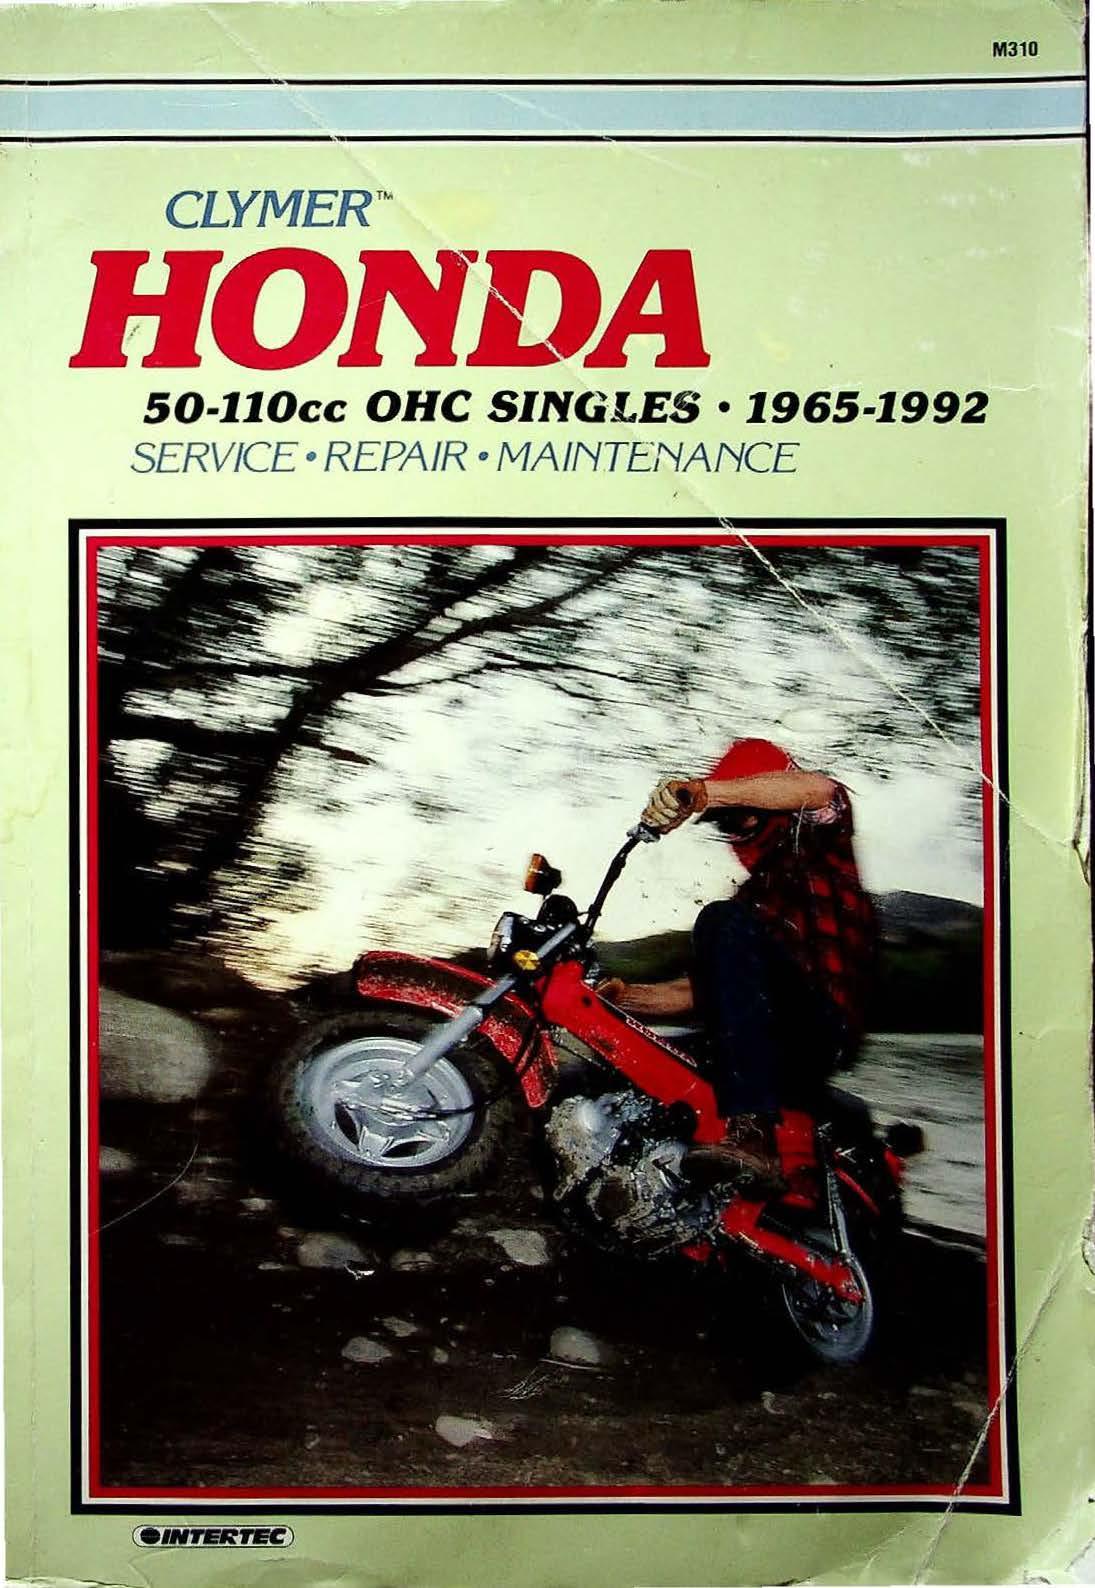 Clymer Honda 50-110cc ohc singles (1965-1992) Workshop Manual